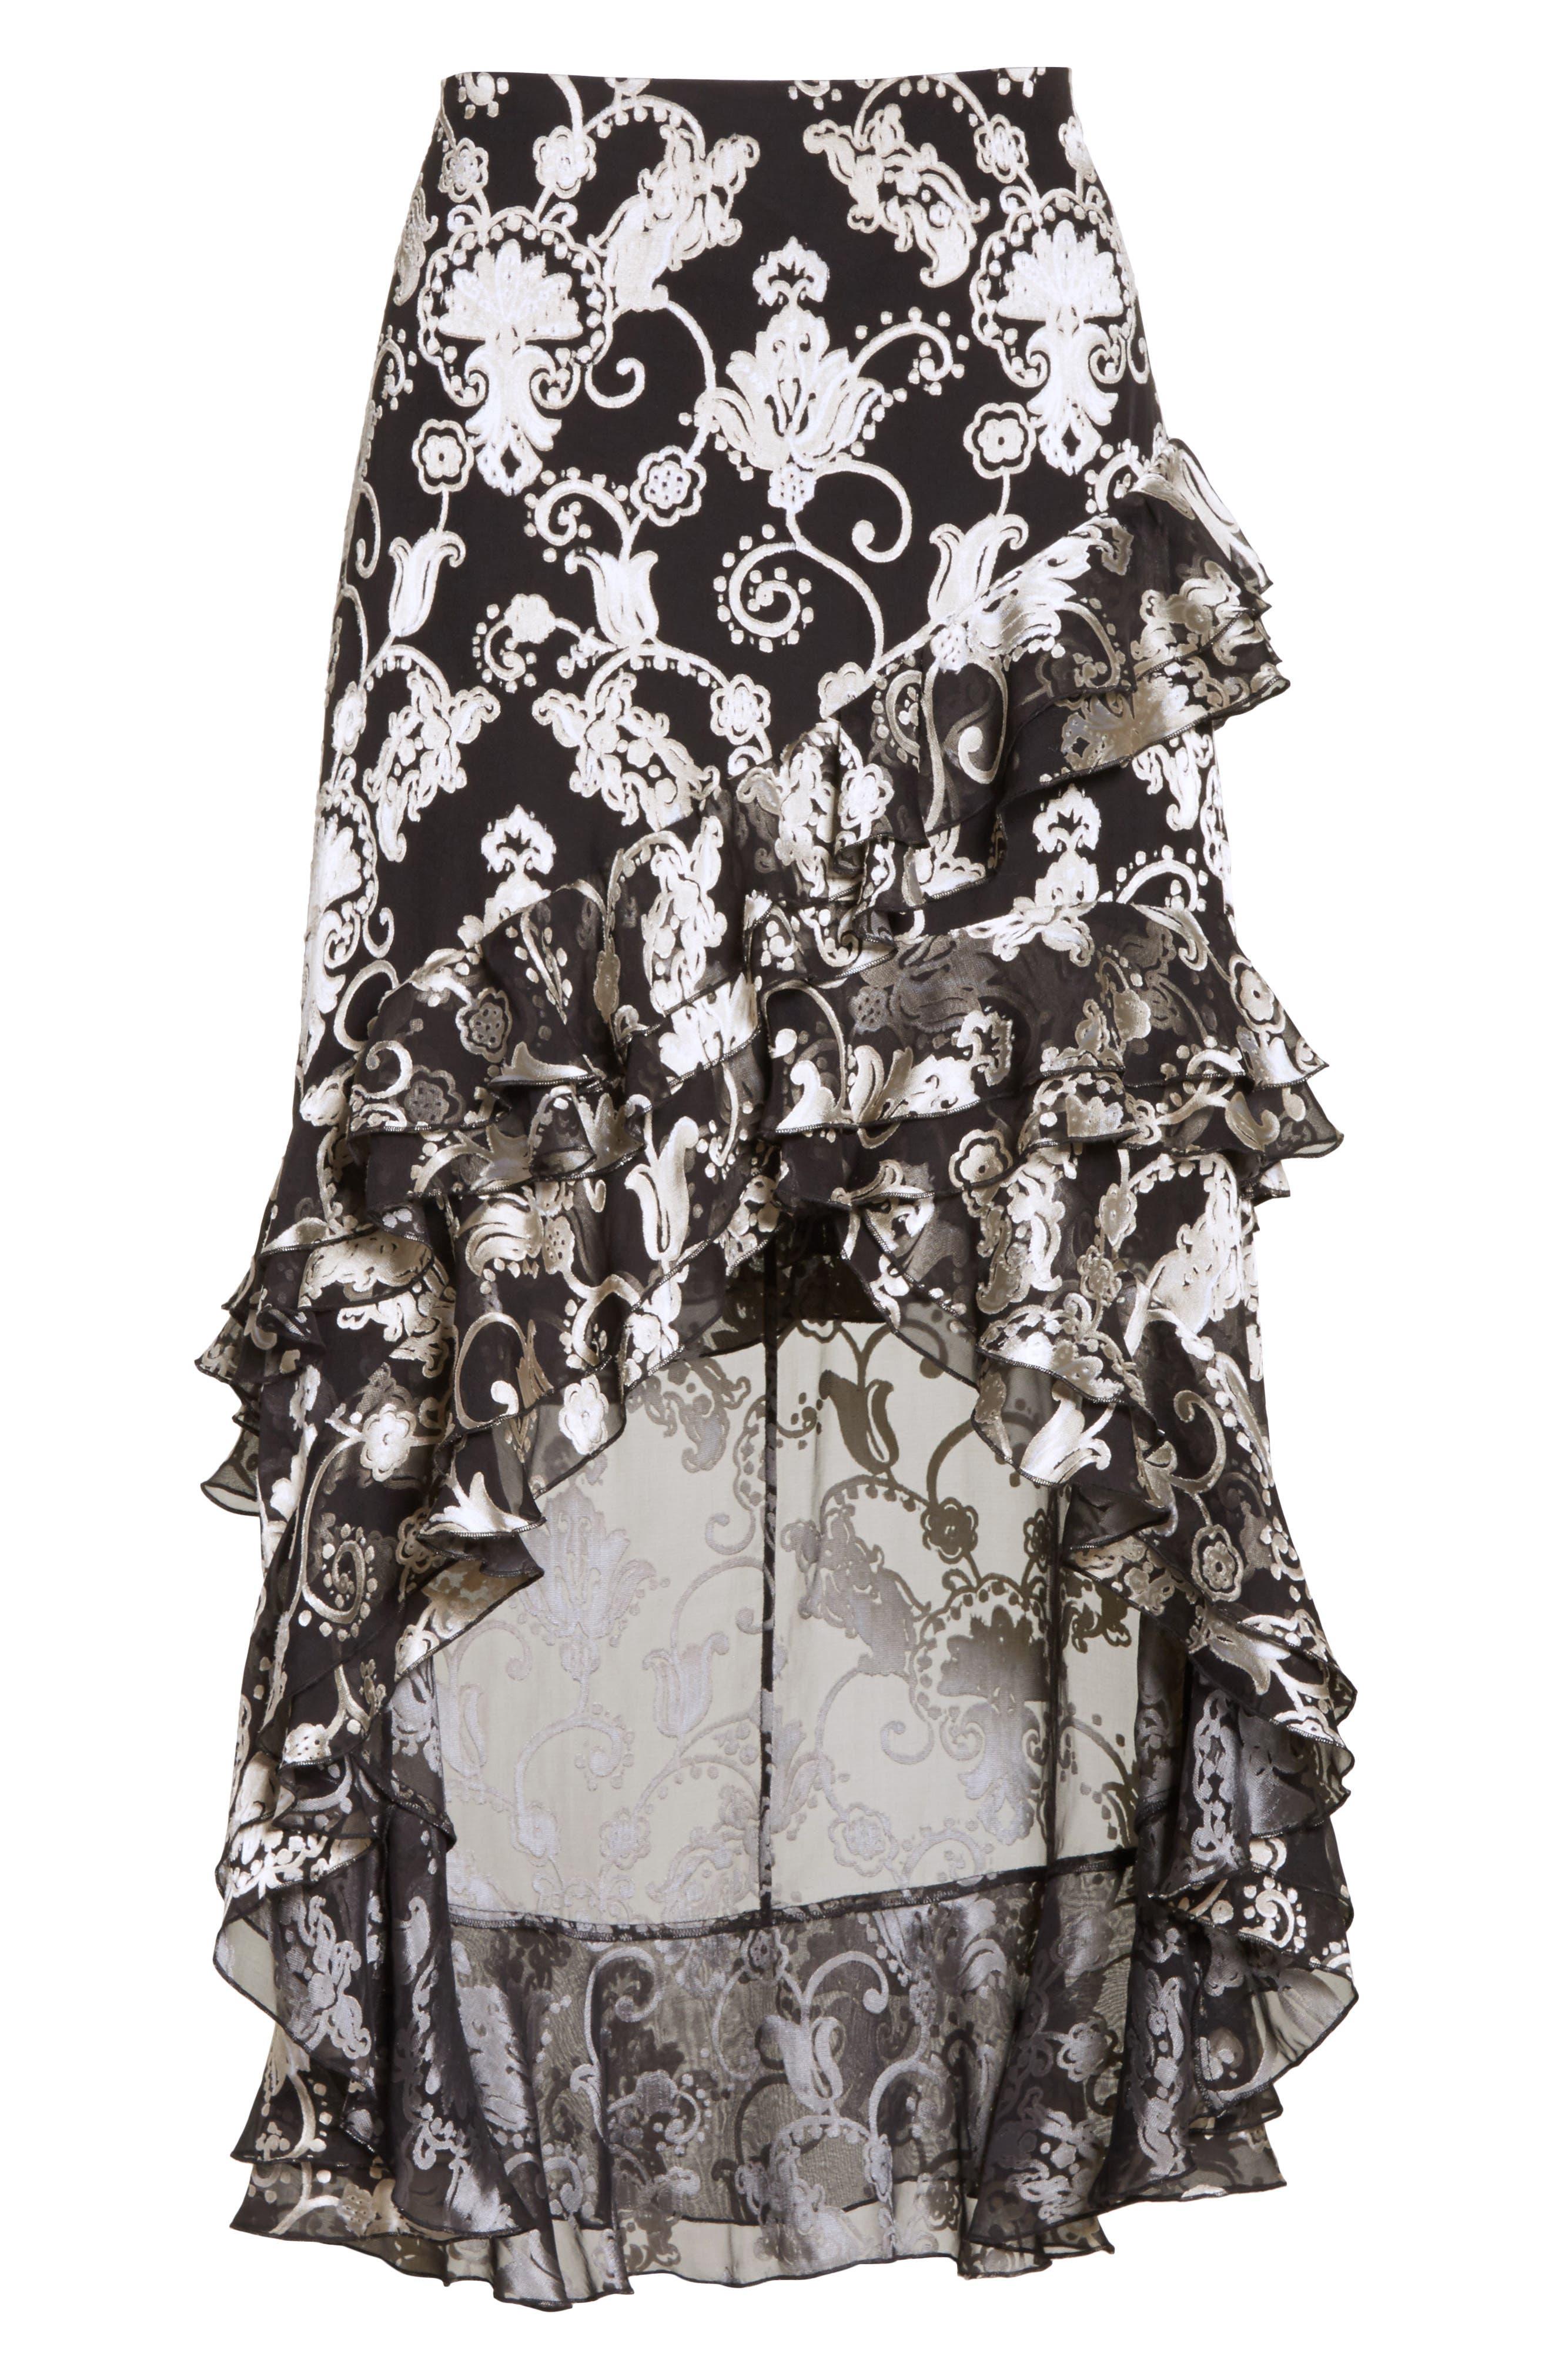 Sasha Asymmetrical Tiered Ruffle Skirt,                             Alternate thumbnail 6, color,                             009